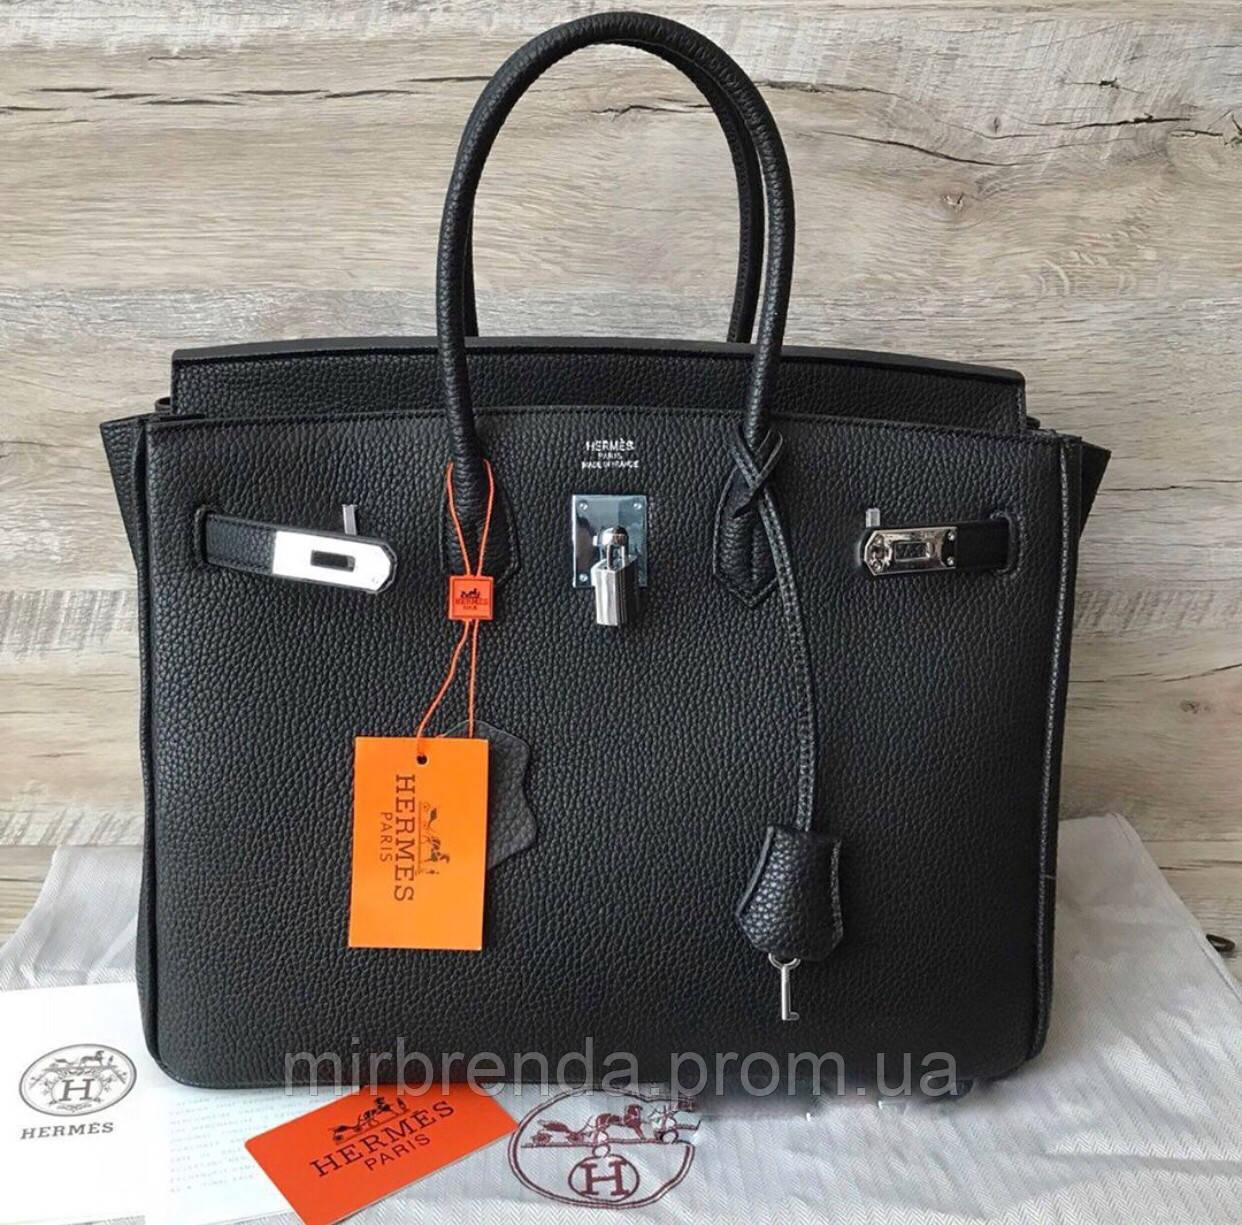 ee74b401560f Брендовые сумки Hermes люкс копия, класс ААА. черная, красная, серая ...